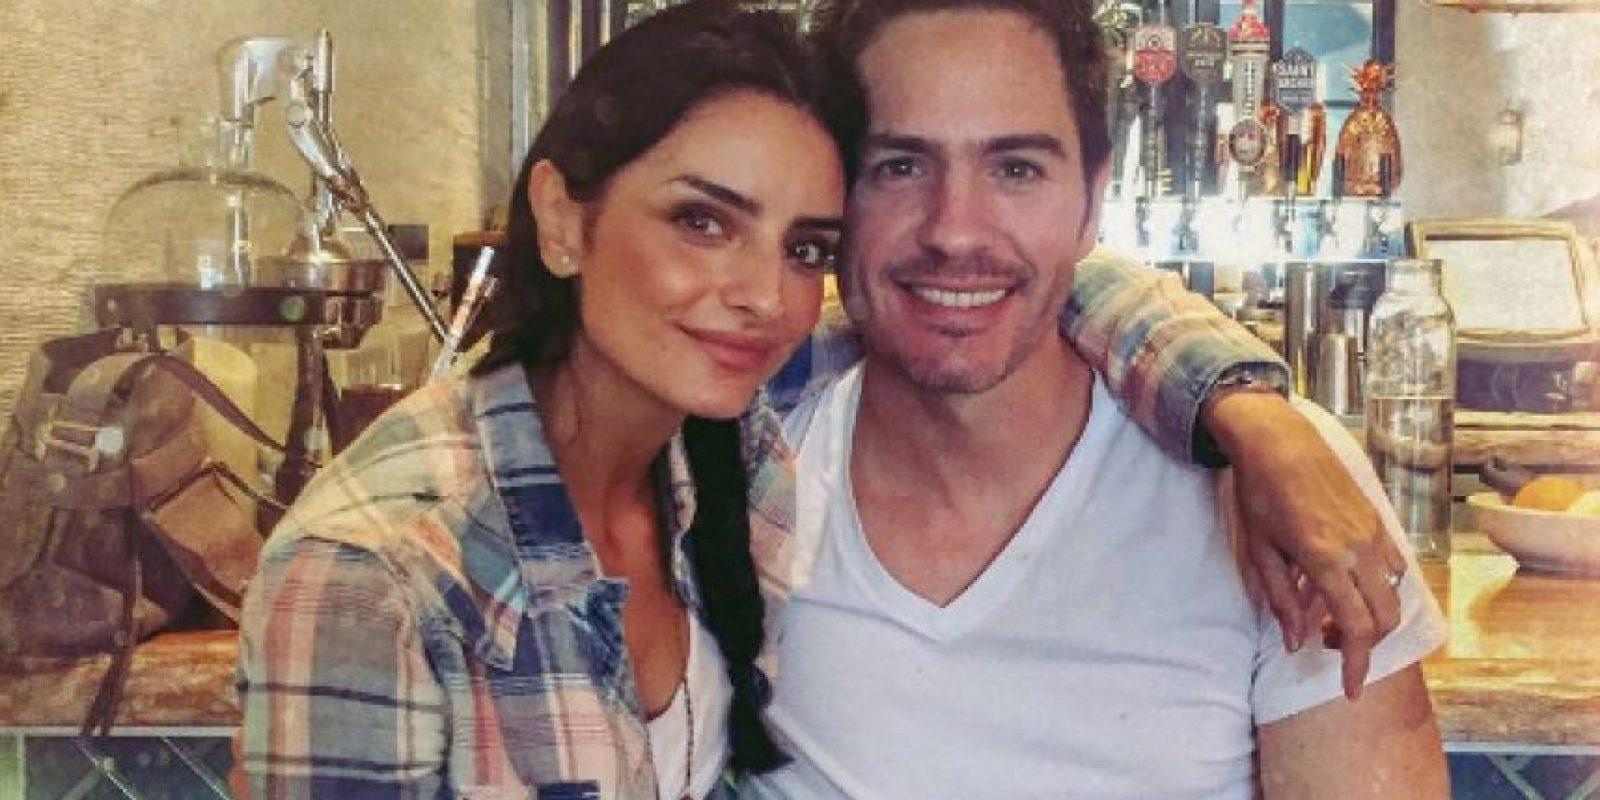 La boda de Aisliinn y Mauricio se celebrará en Tepoztlán Foto:Instagram